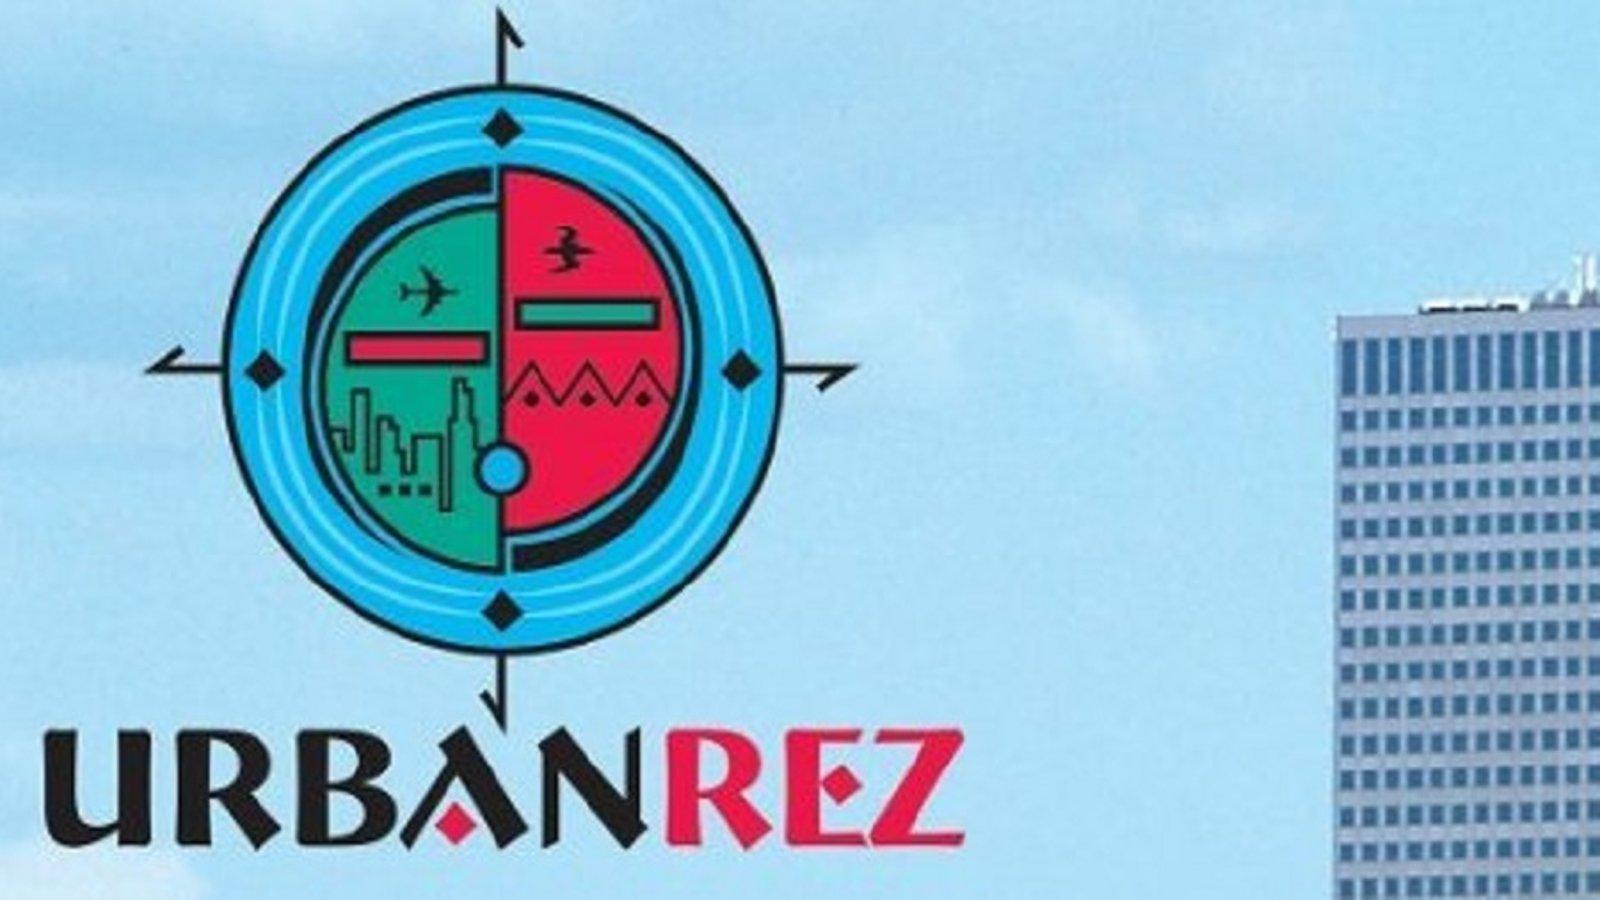 Urban Rez - The Repercussions of the Native American Urban Relocation Program